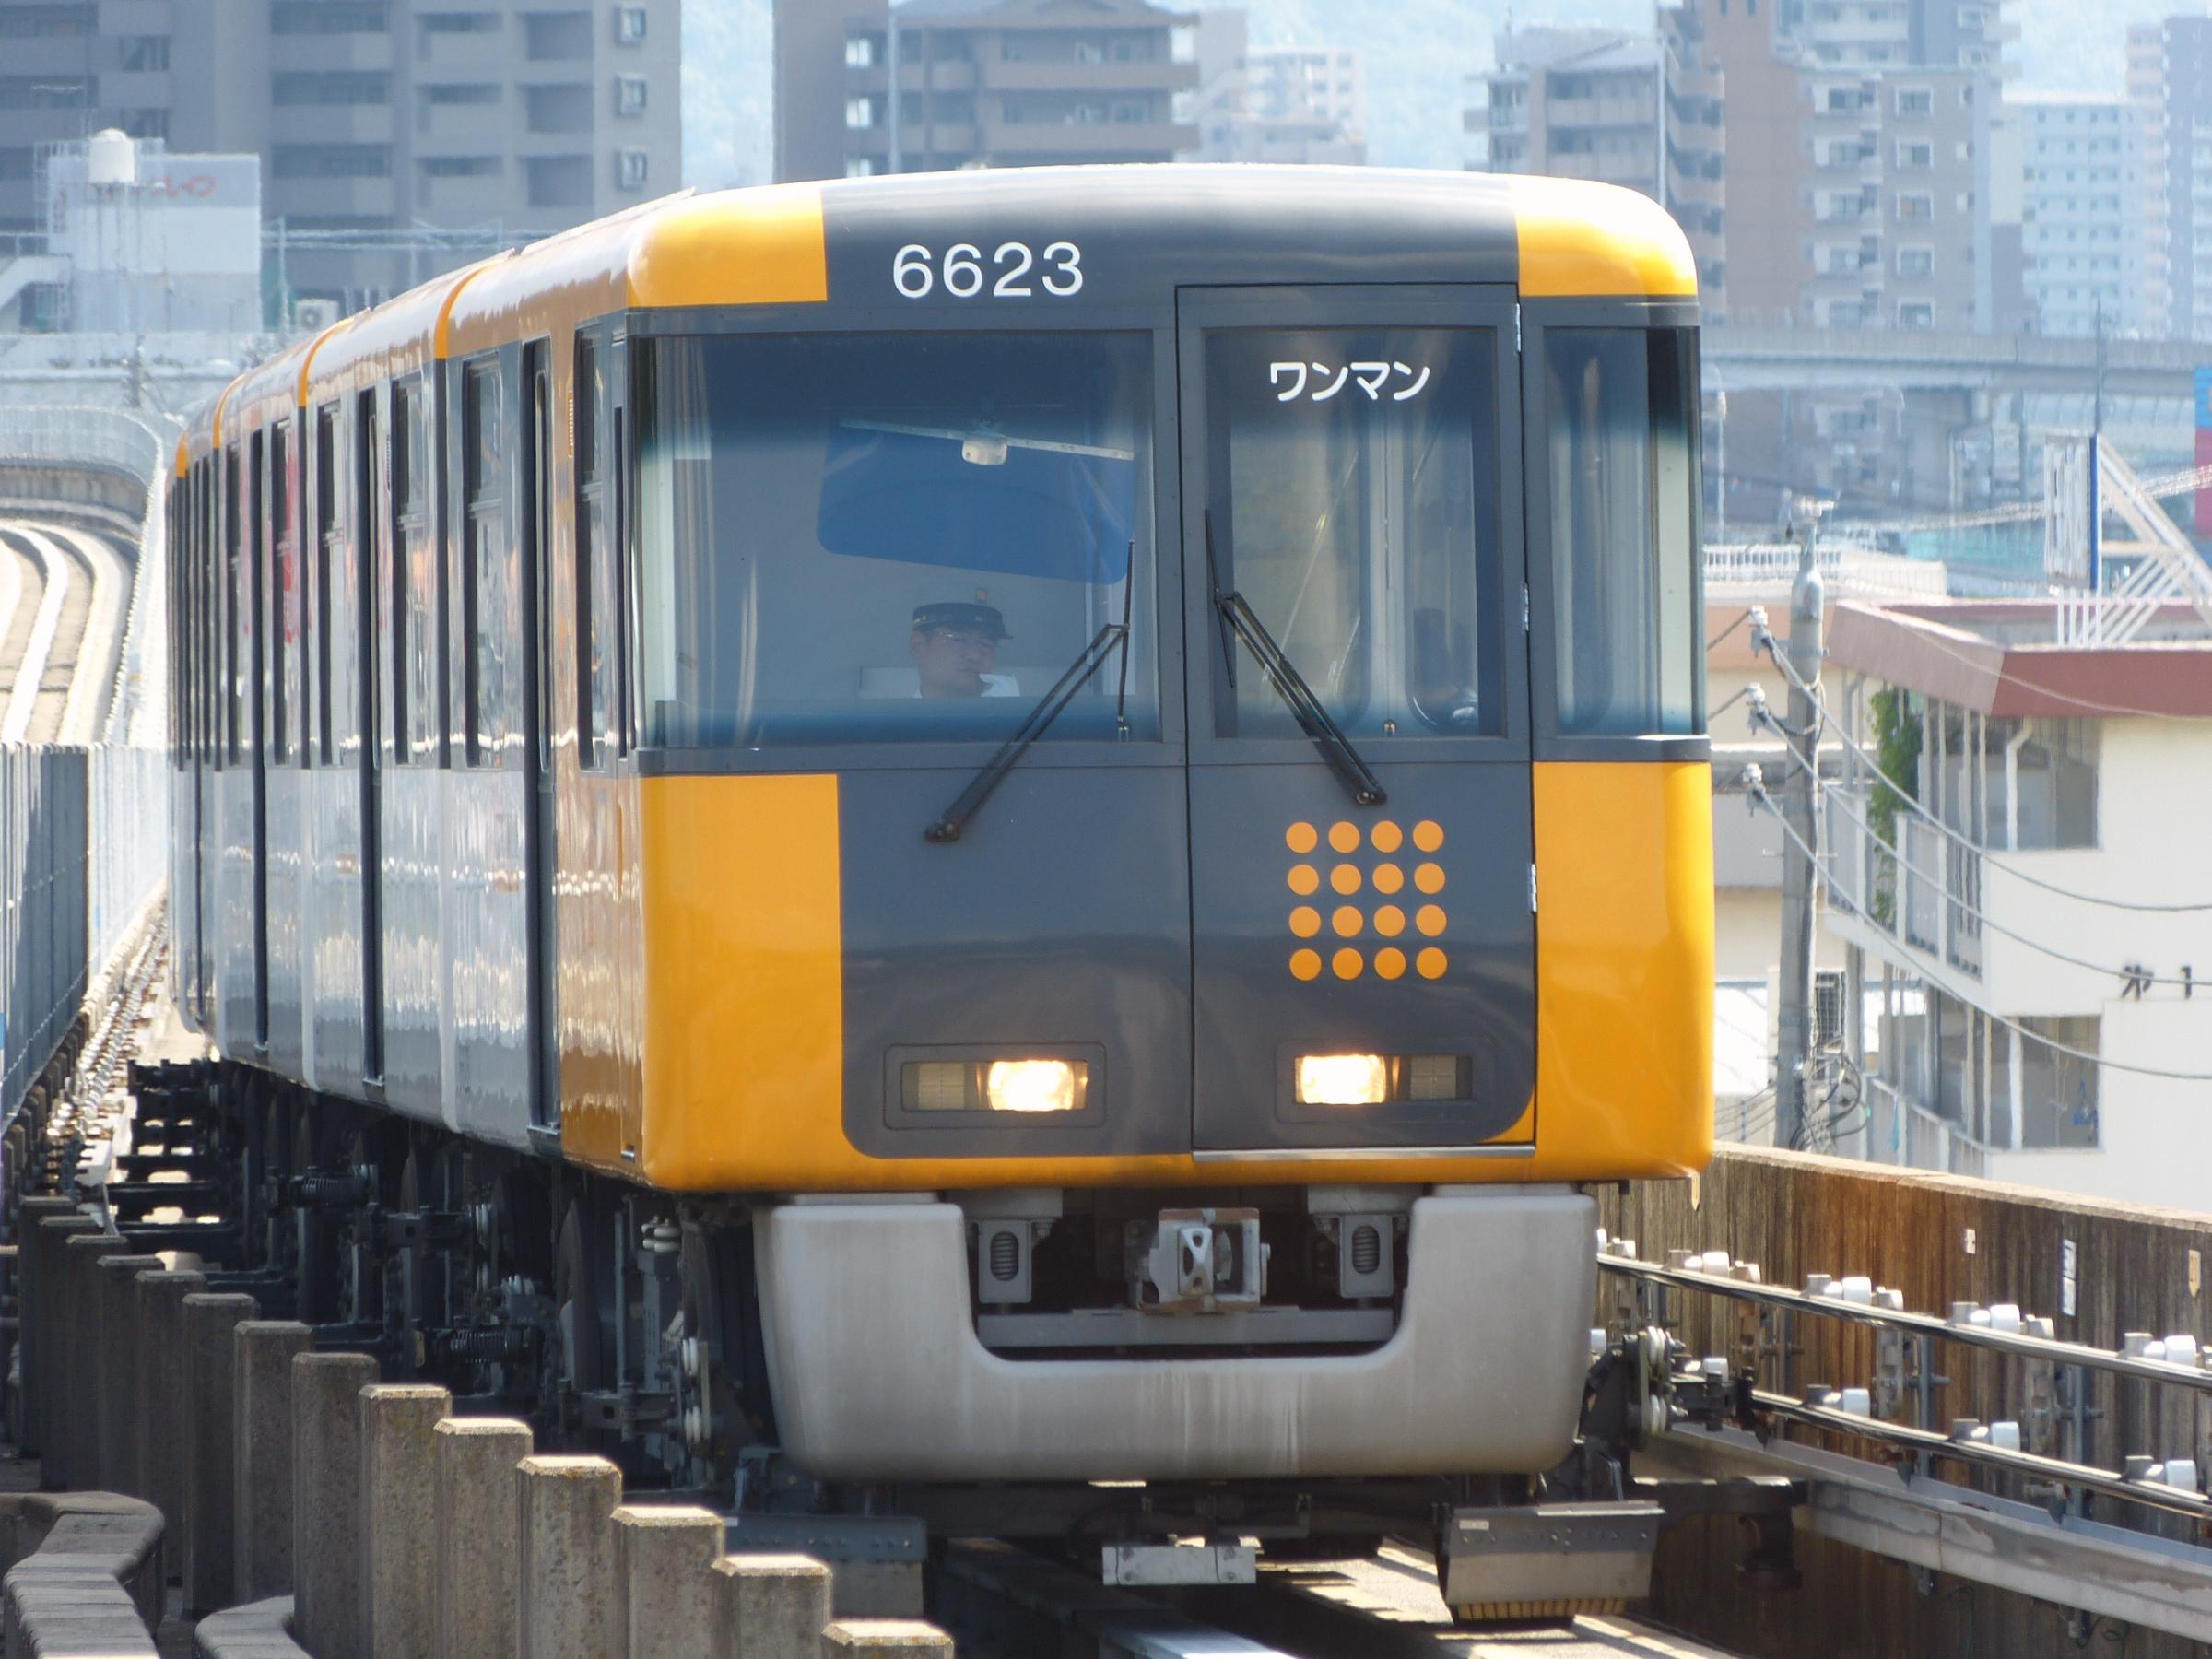 El juego de las imagenes-http://upload.wikimedia.org/wikipedia/commons/c/c1/Hiroshima_Rapid_Transit_Astram_Line_6623.jpg